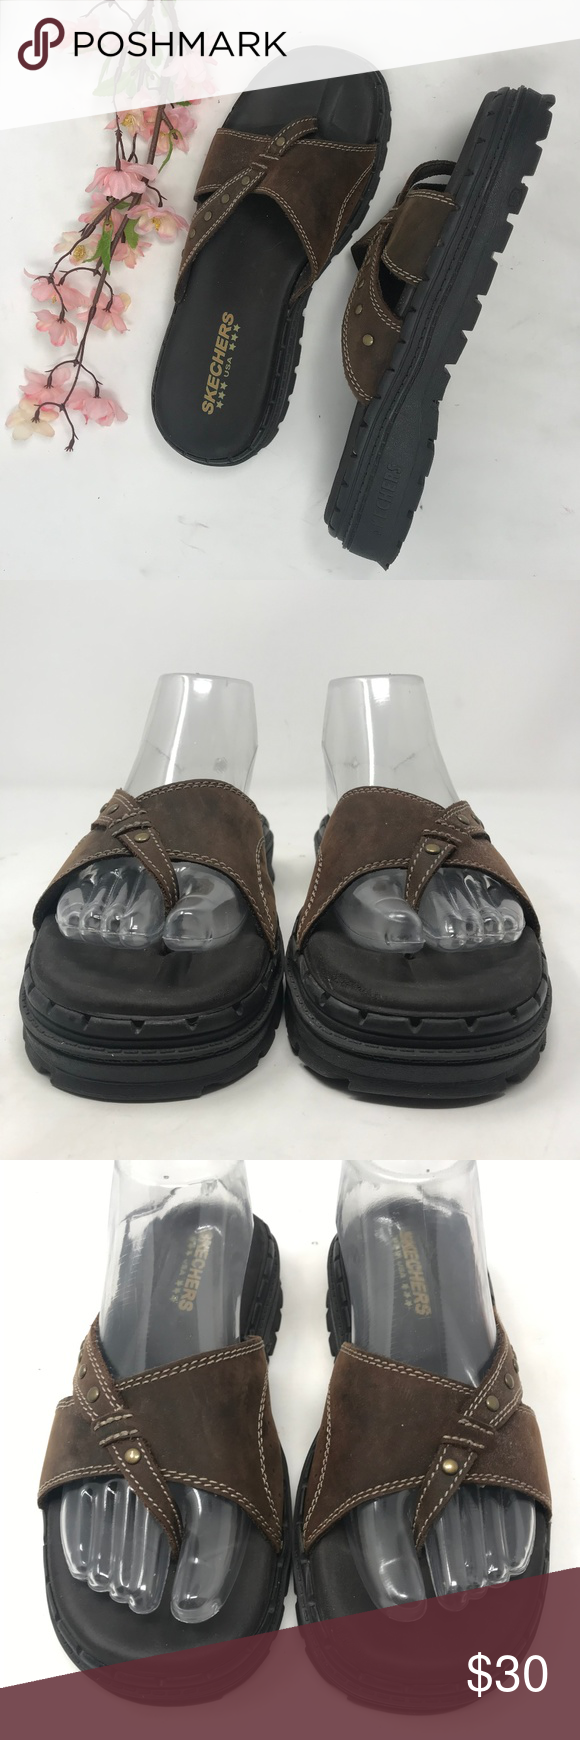 Skechers Jammers Vintage Chunky Sandals Grunge 8 Brand Skechers